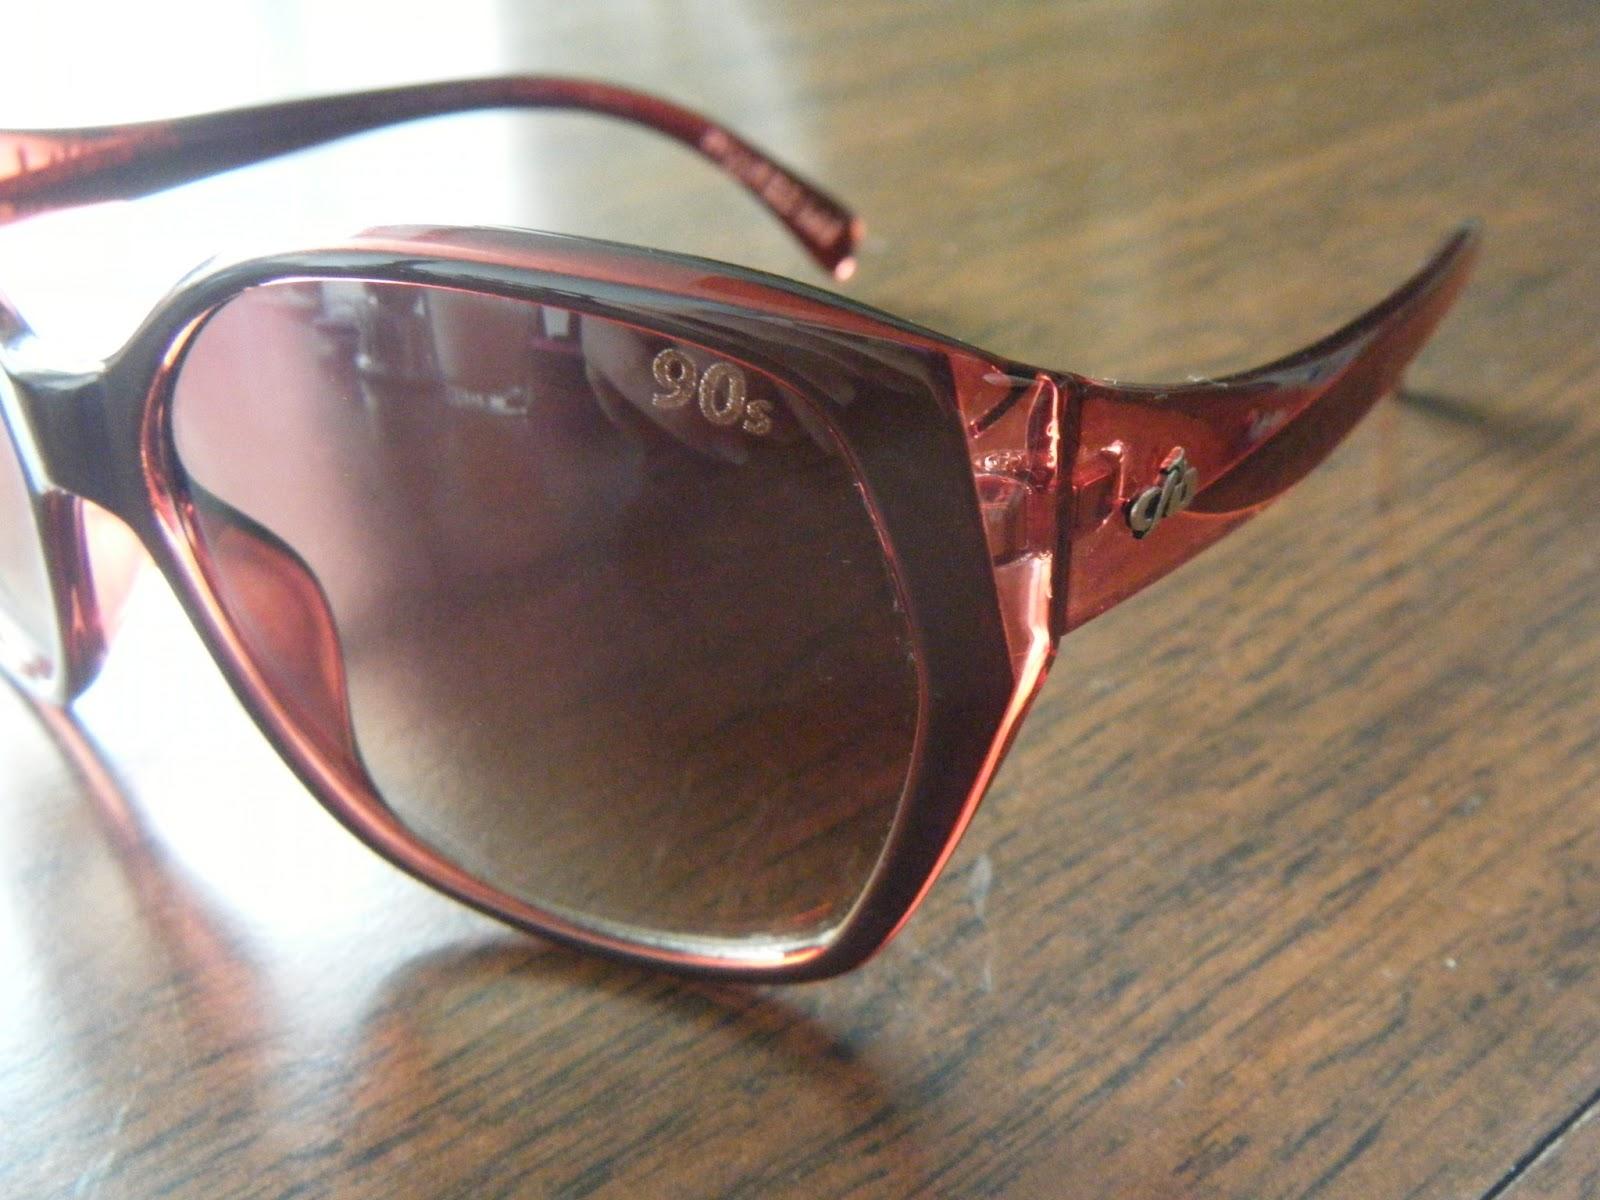 New In: Chilli Beans sunglasses